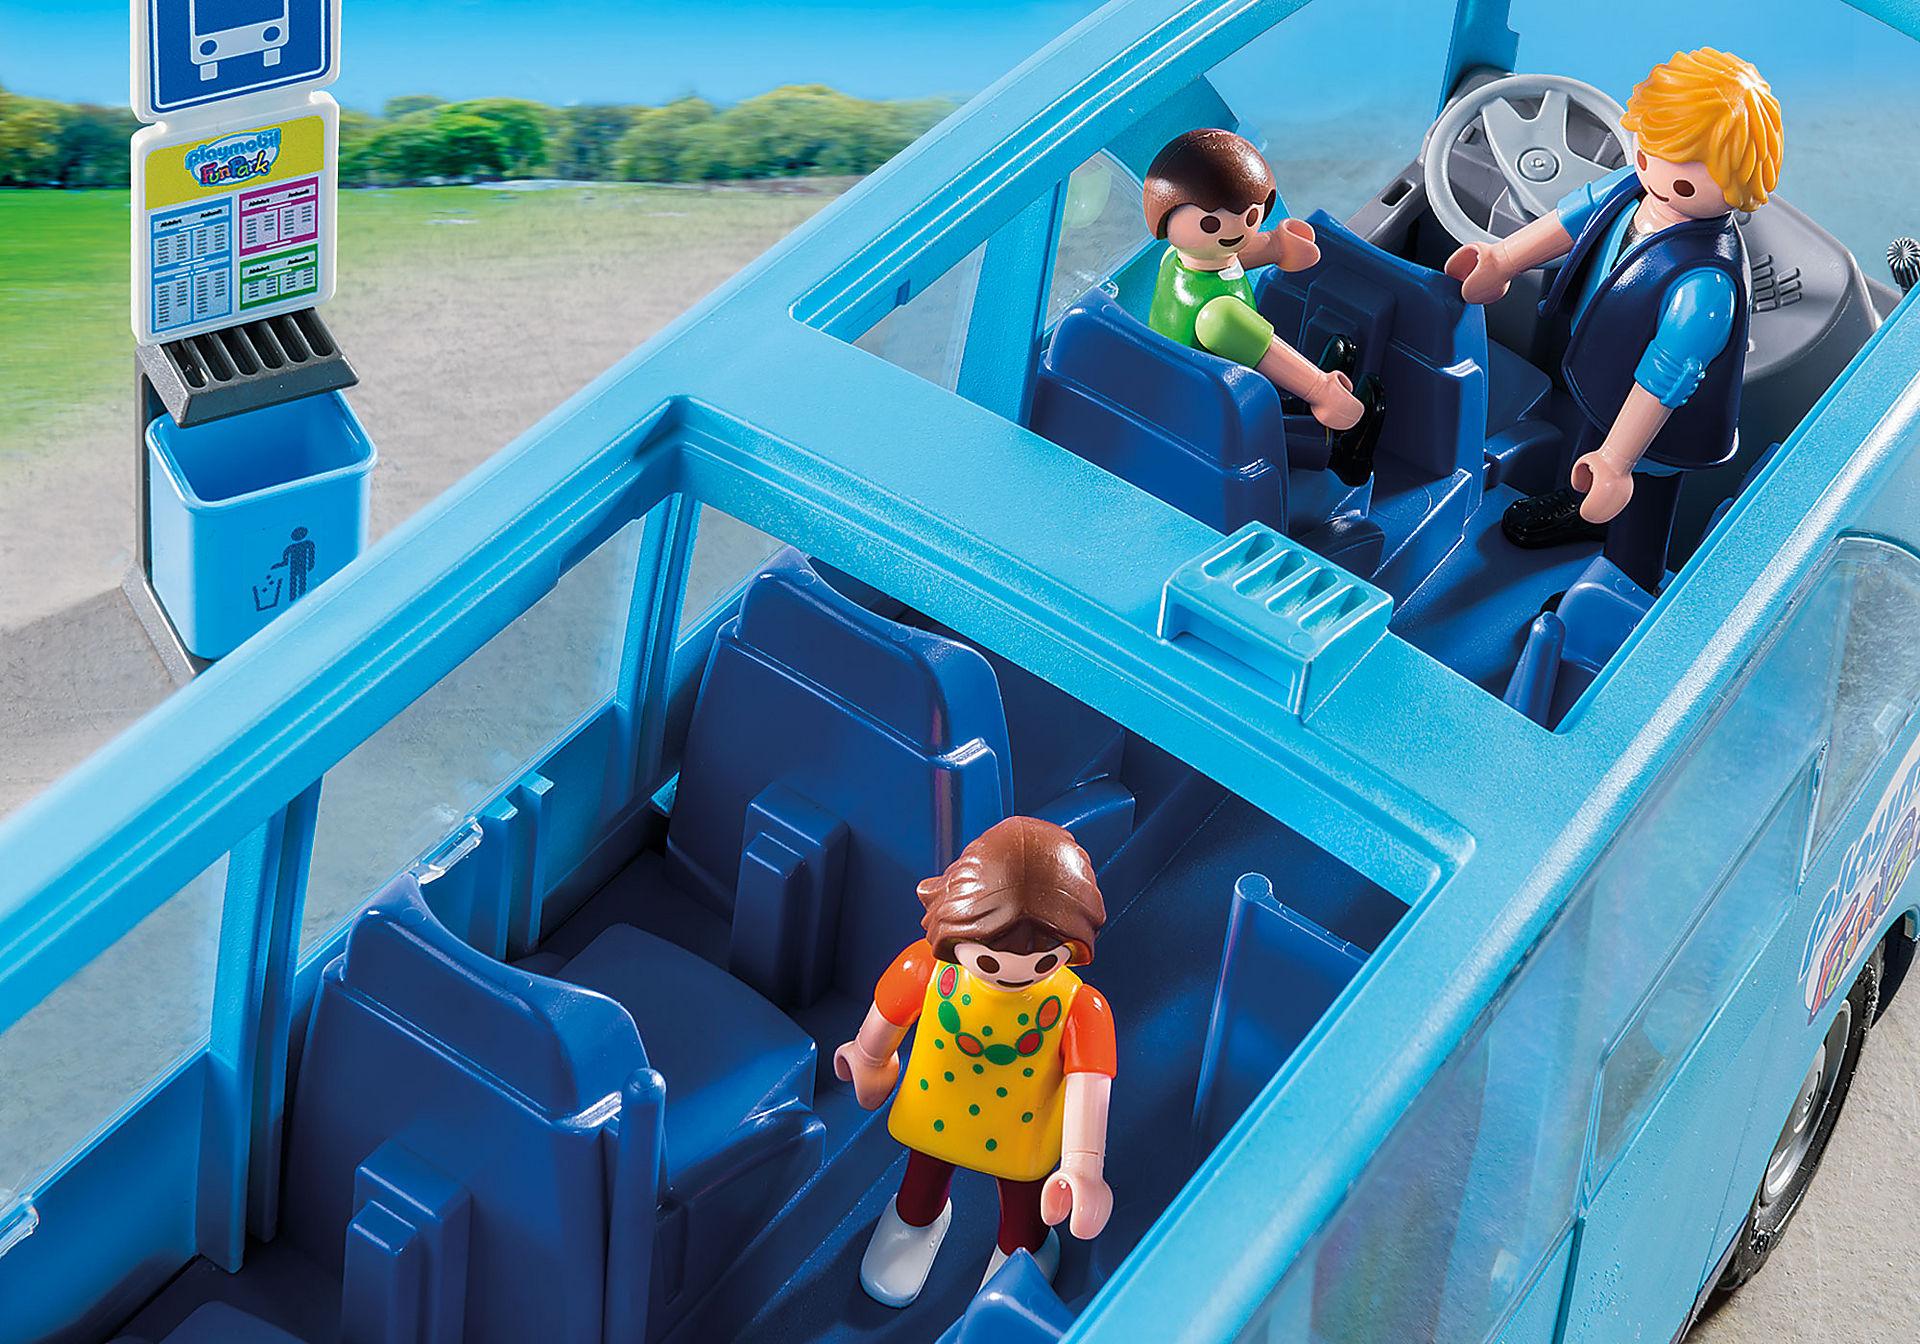 http://media.playmobil.com/i/playmobil/9117_product_extra2/PLAYMOBIL-FunPark Bus